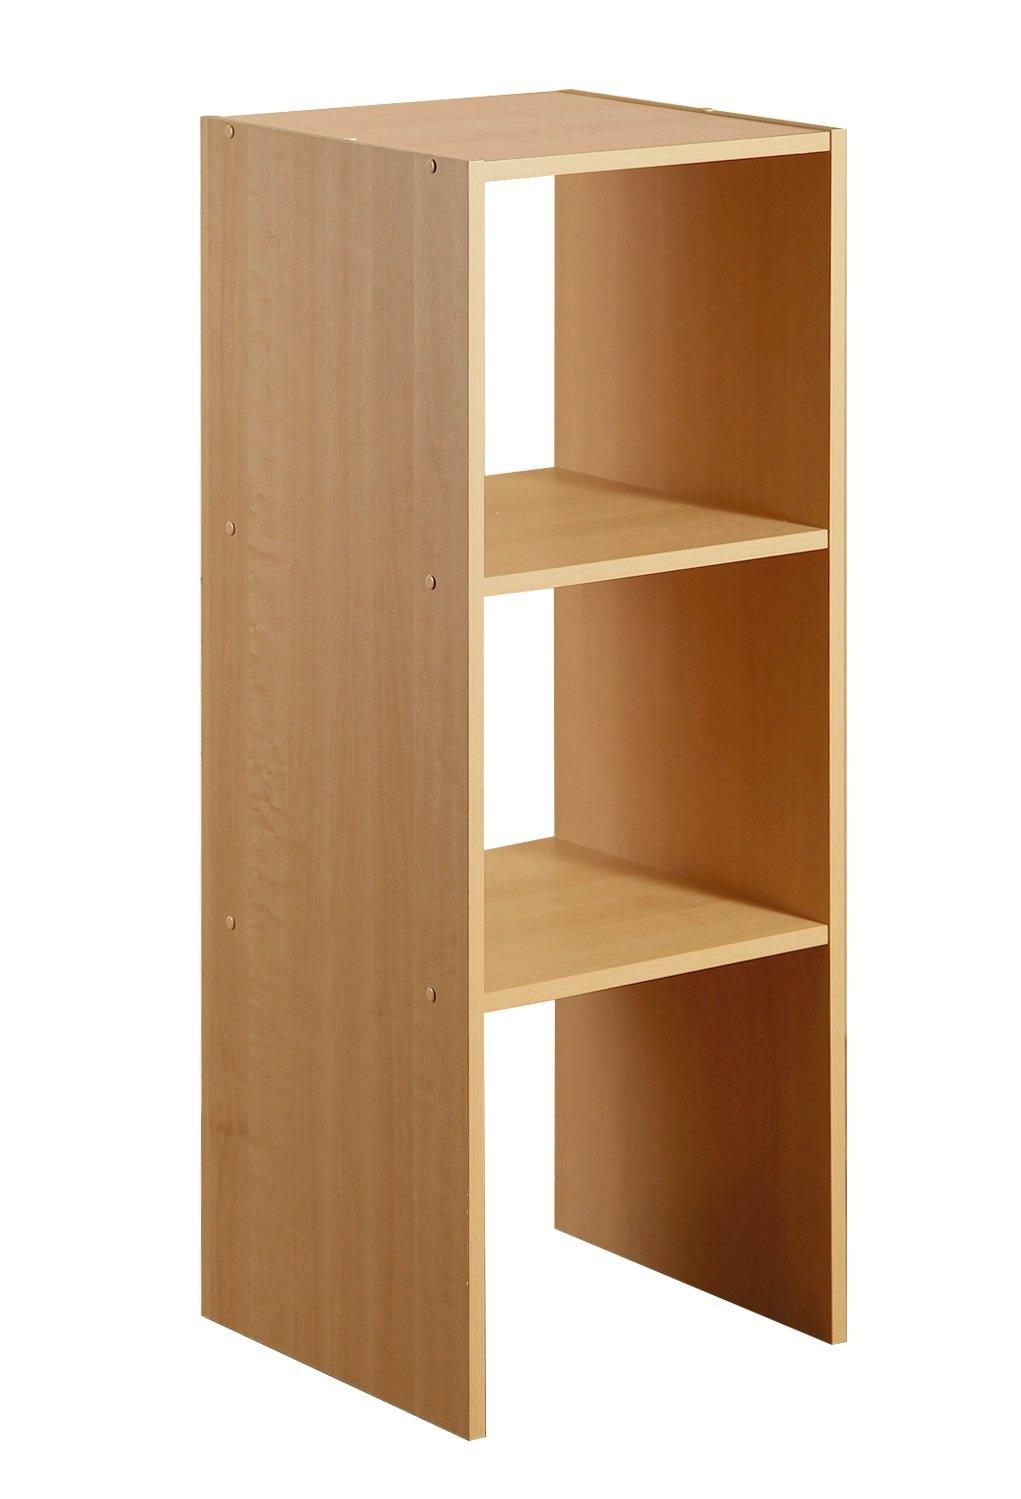 2-Shelf Organizer, Maple